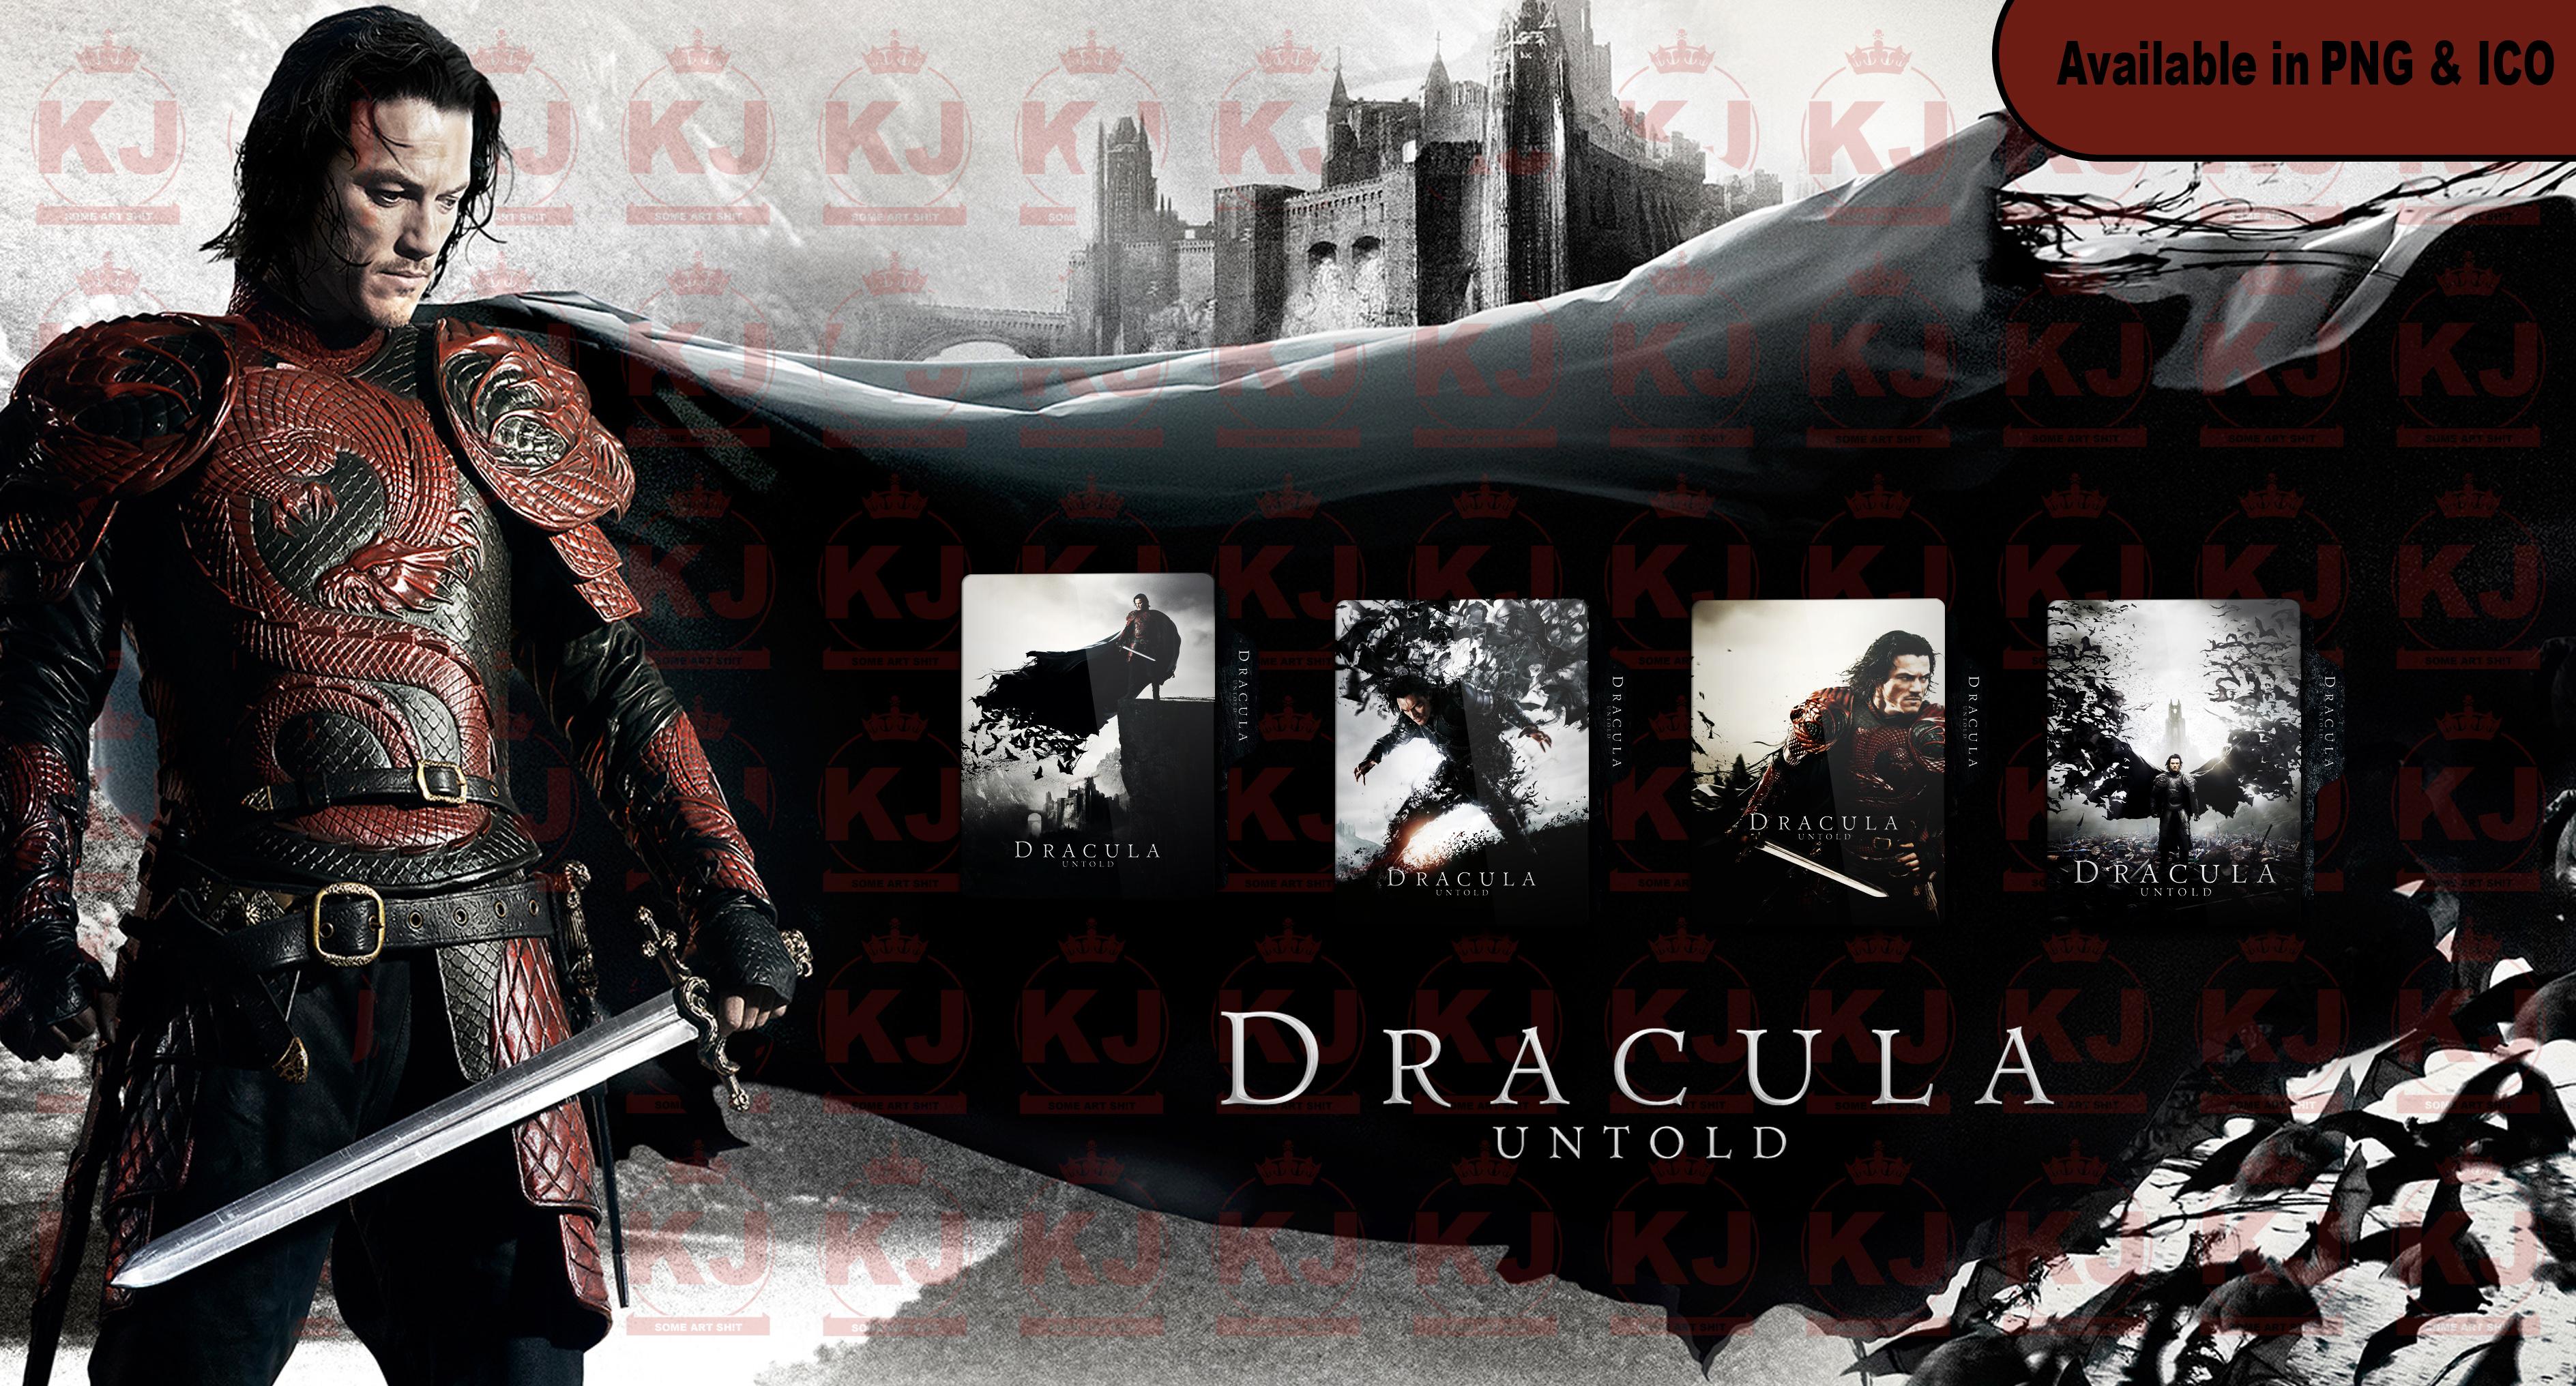 Dracula Untold 2014 By Kingjoe93 On Deviantart